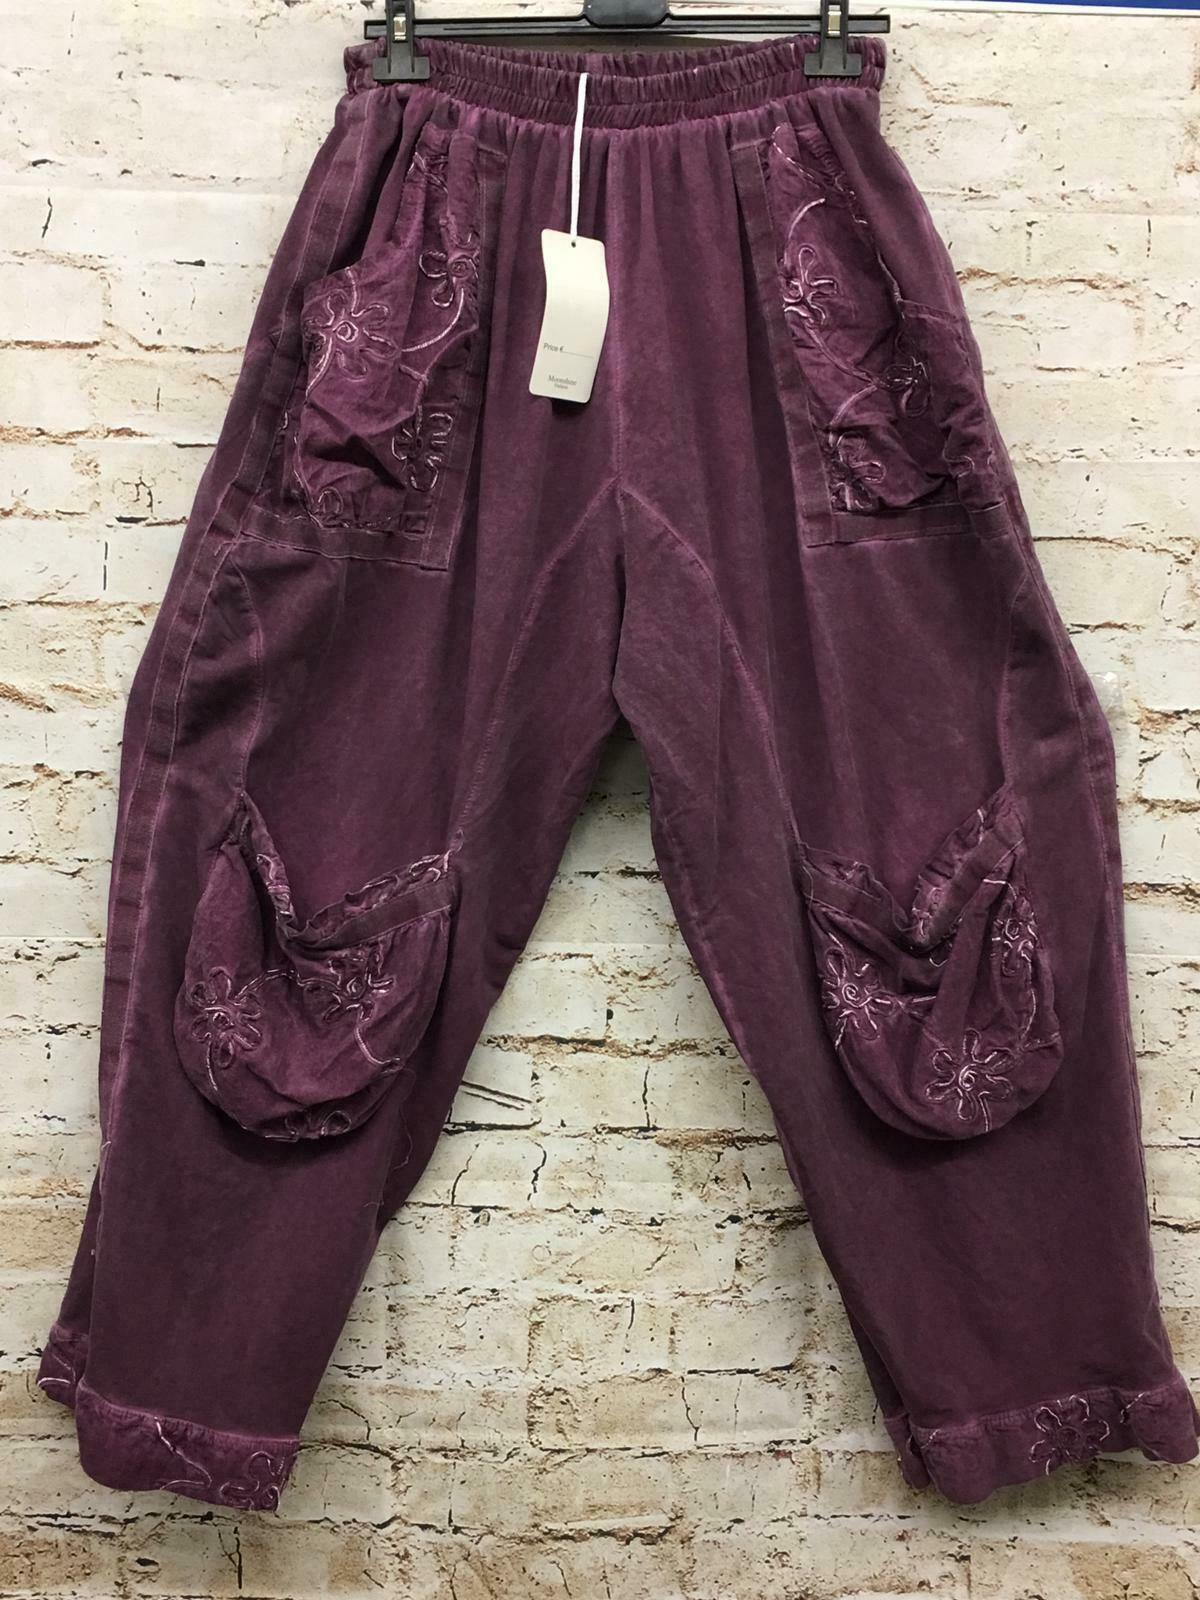 6c4f588828c1 Moonshine Fashion Hose Lagenlook 44 46 48 48 50 Cord Übergrösse Neu ...